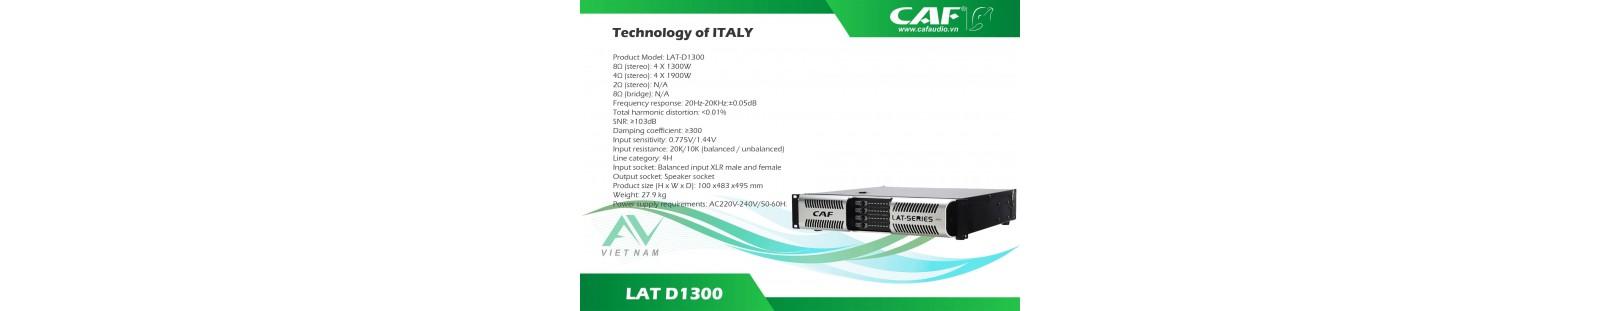 CAF LAT D1300